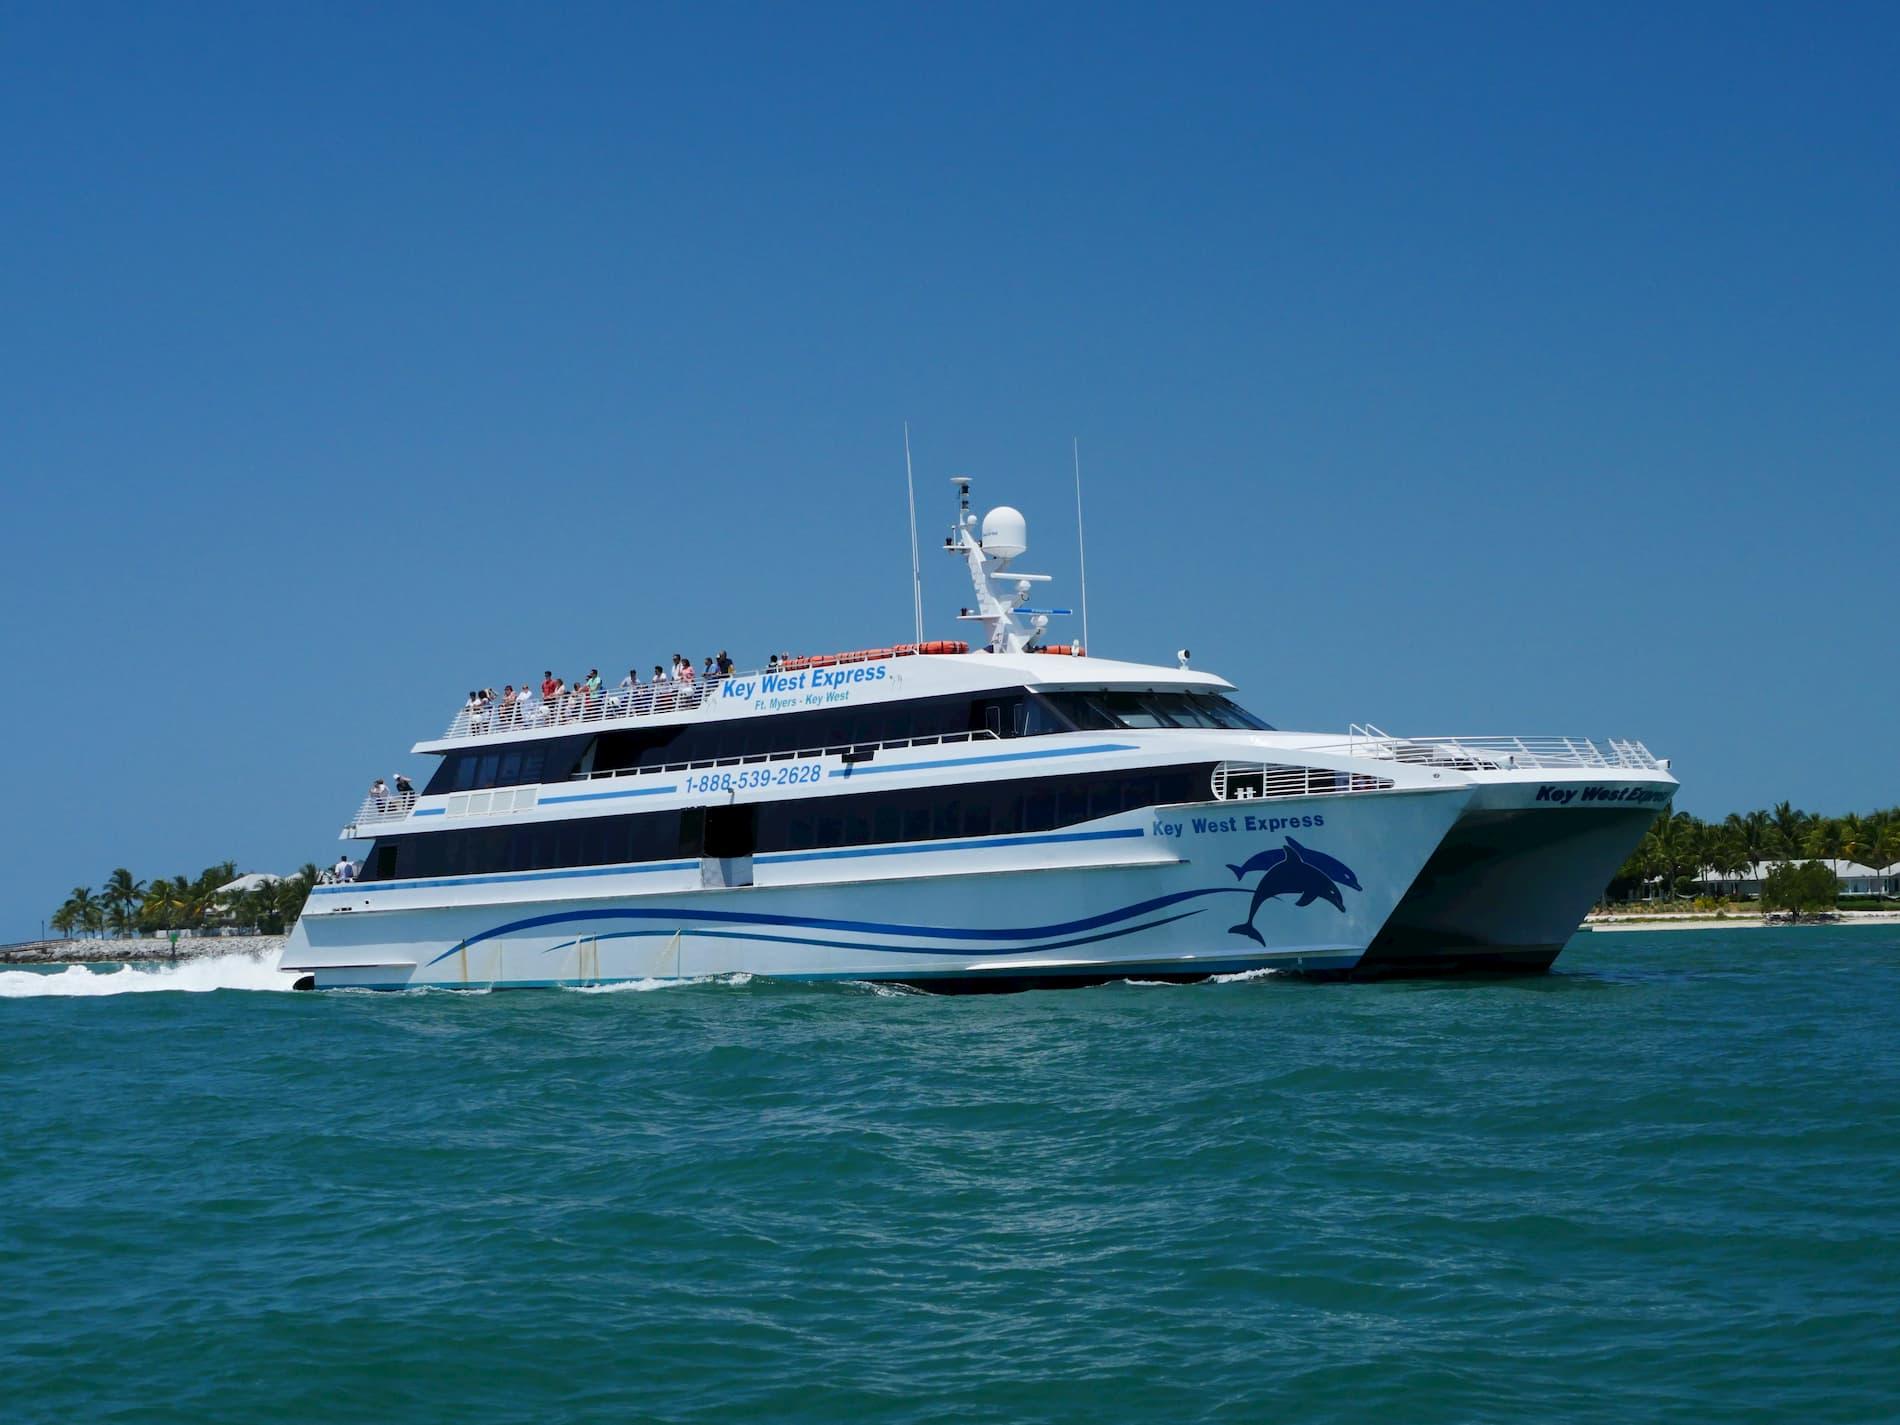 key west express ferry boats rh keywestexpress net fort myers to key west ferry fort myers to key west ferry